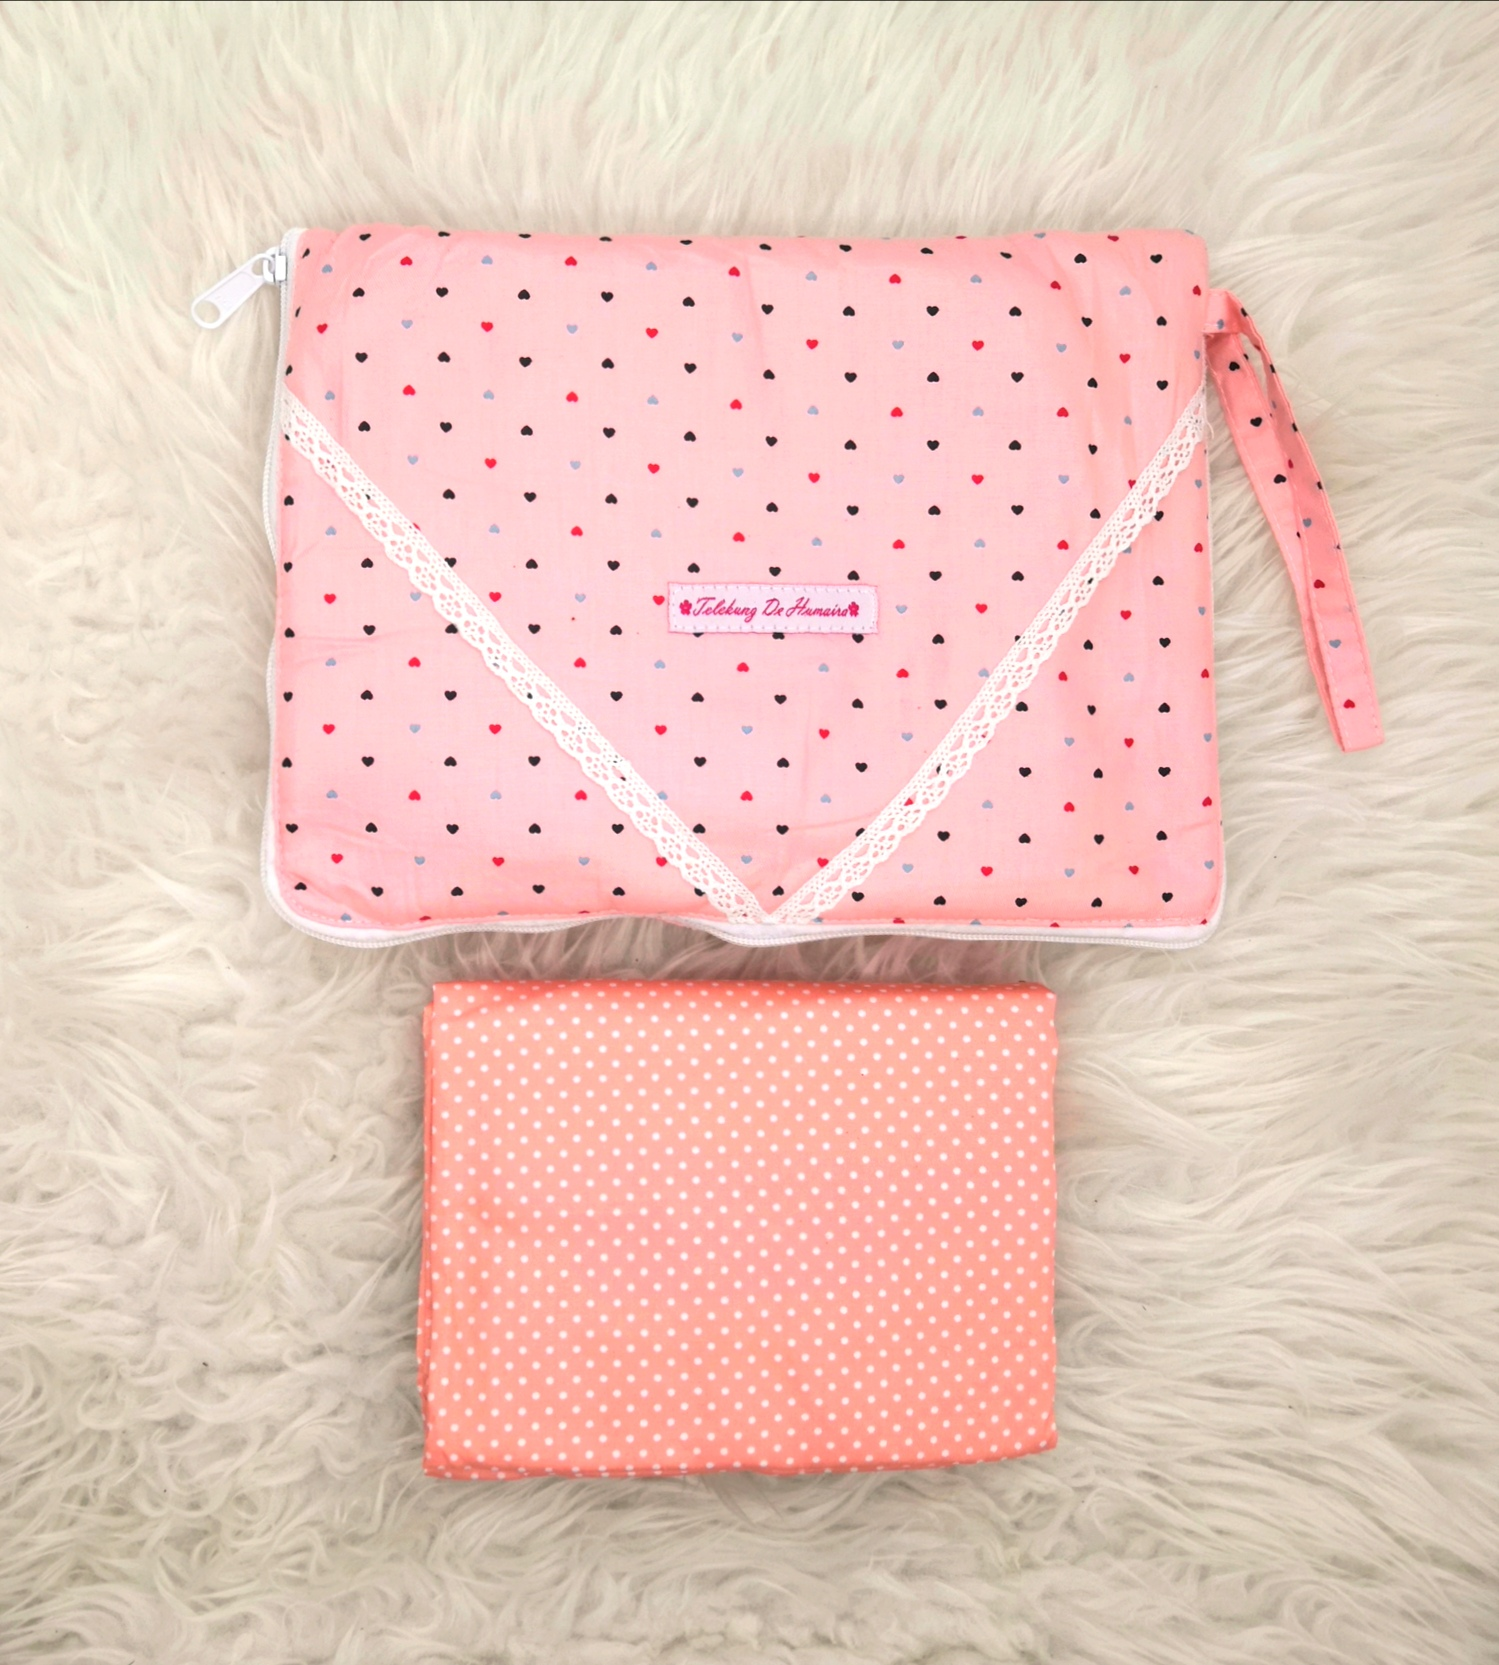 Telekung De Humaira in Love Pink